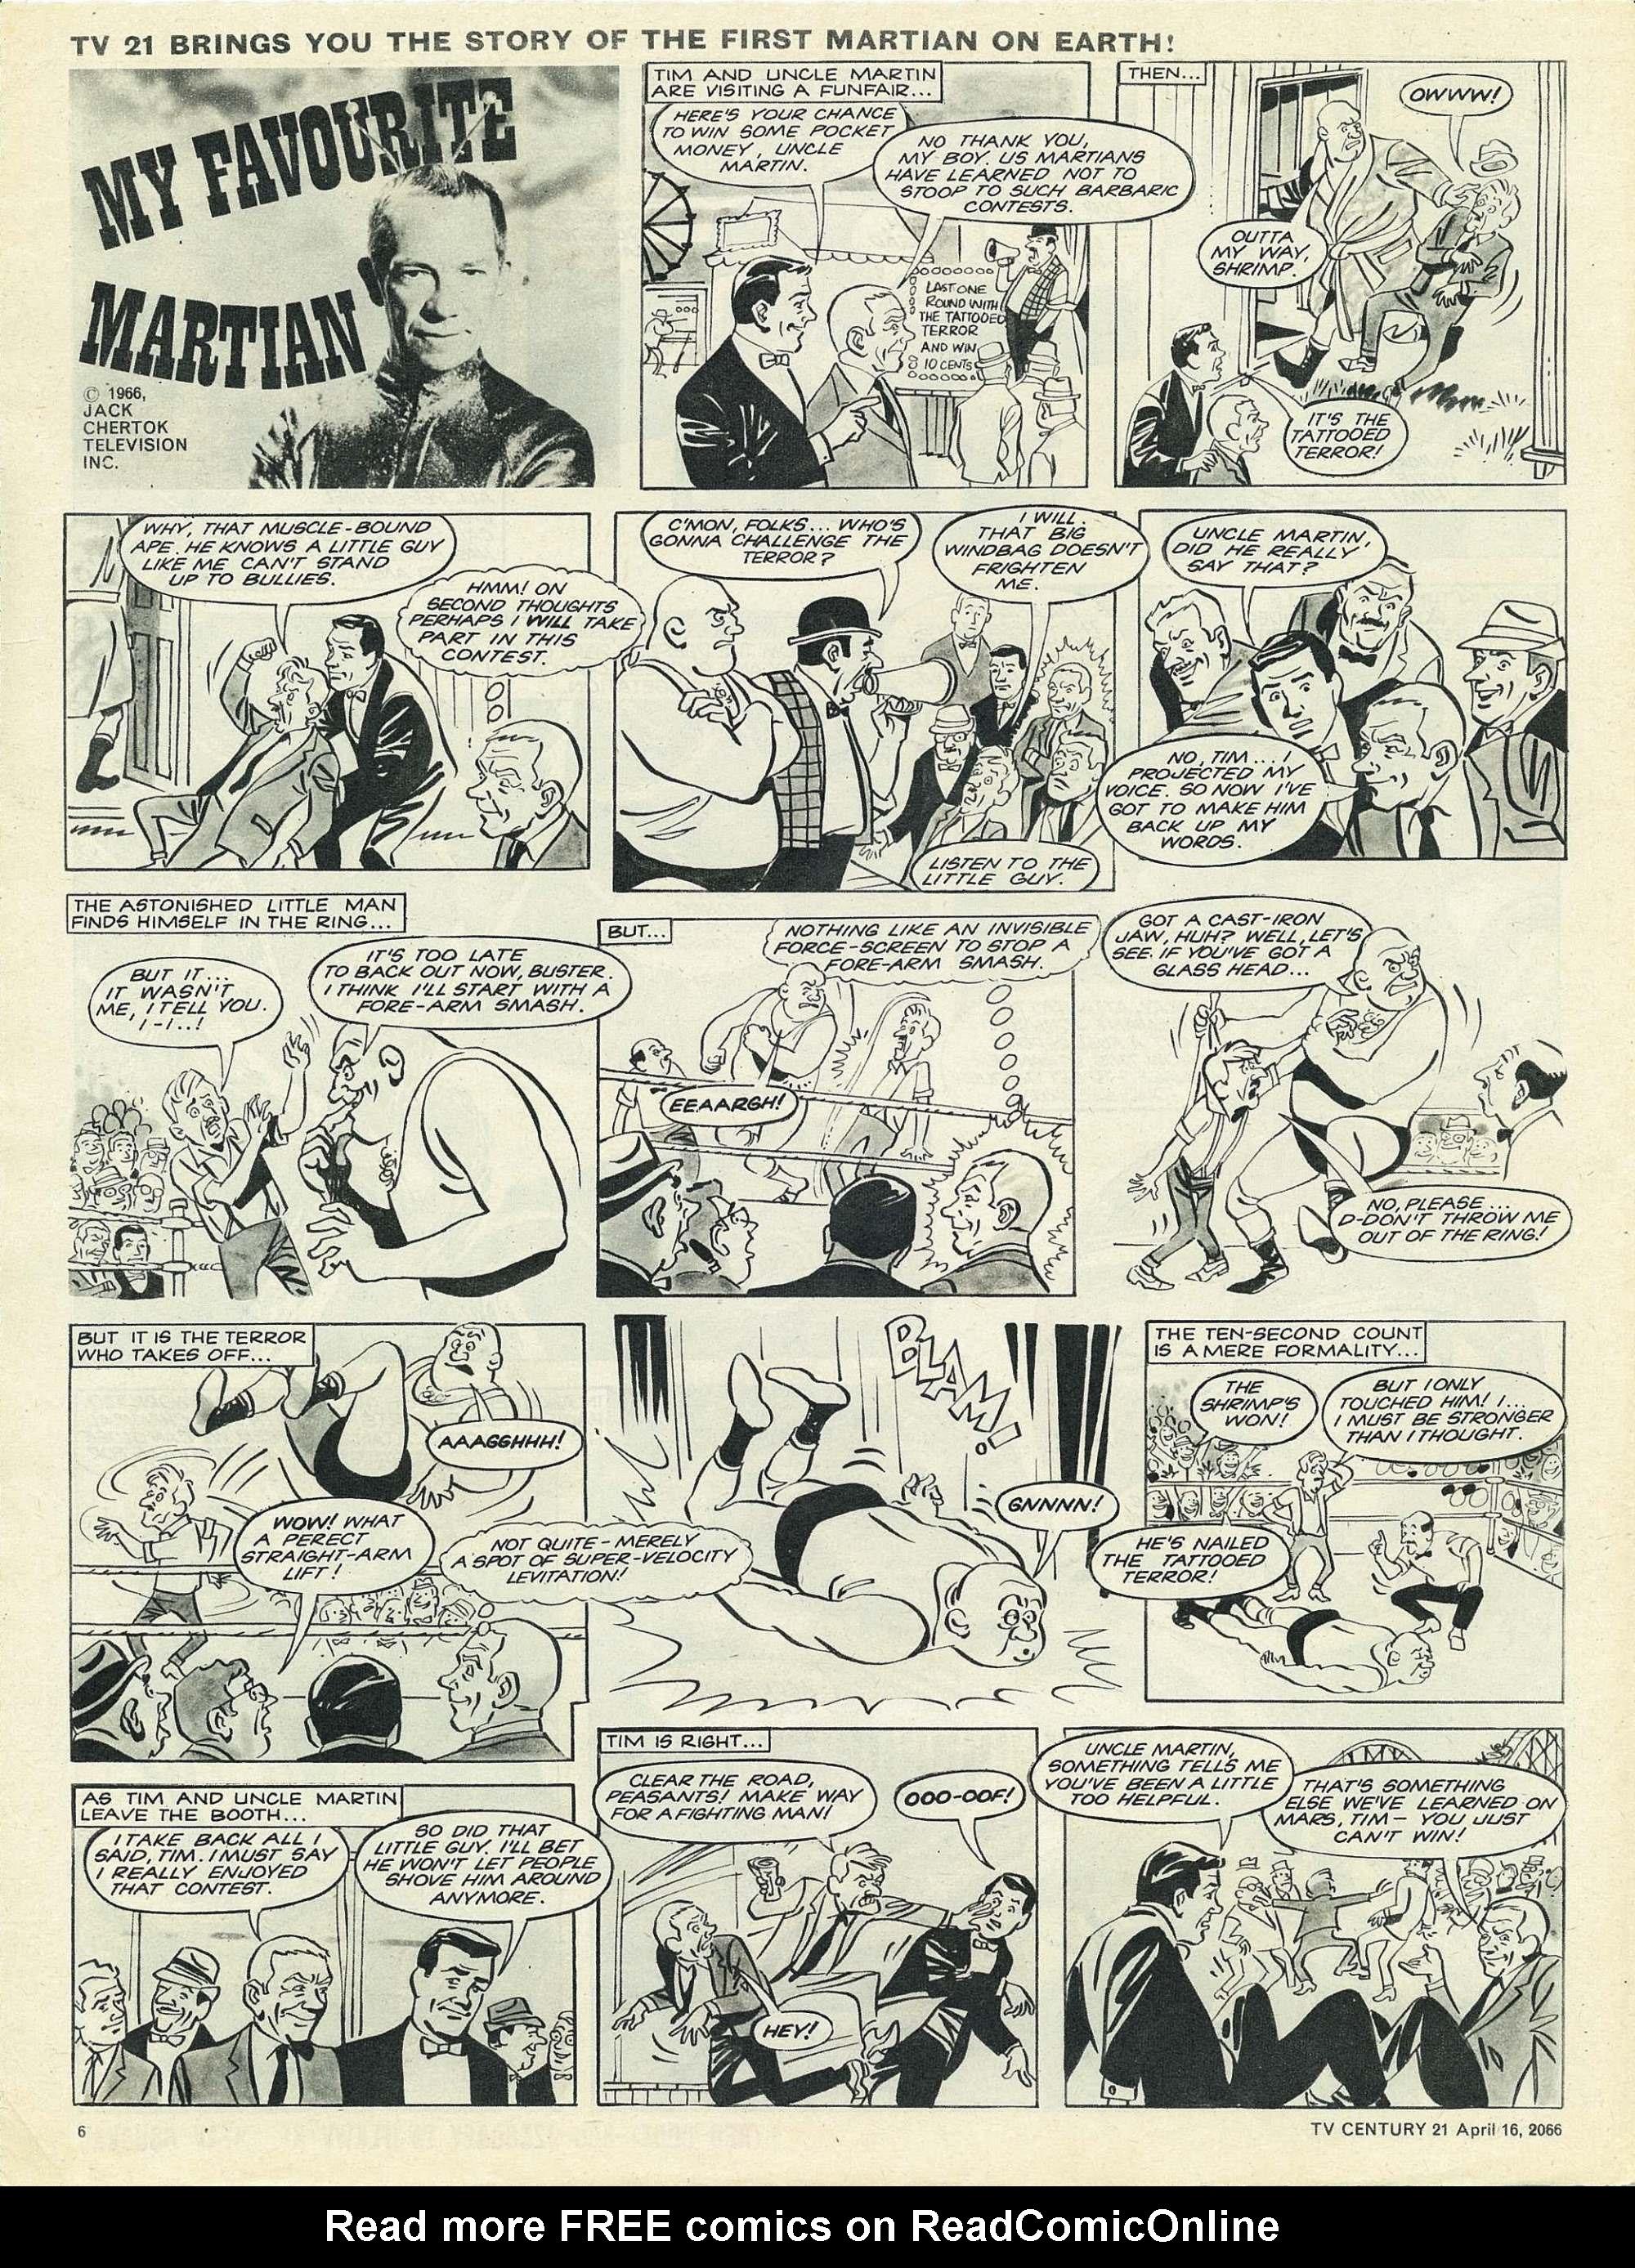 Read online TV Century 21 (TV 21) comic -  Issue #65 - 6